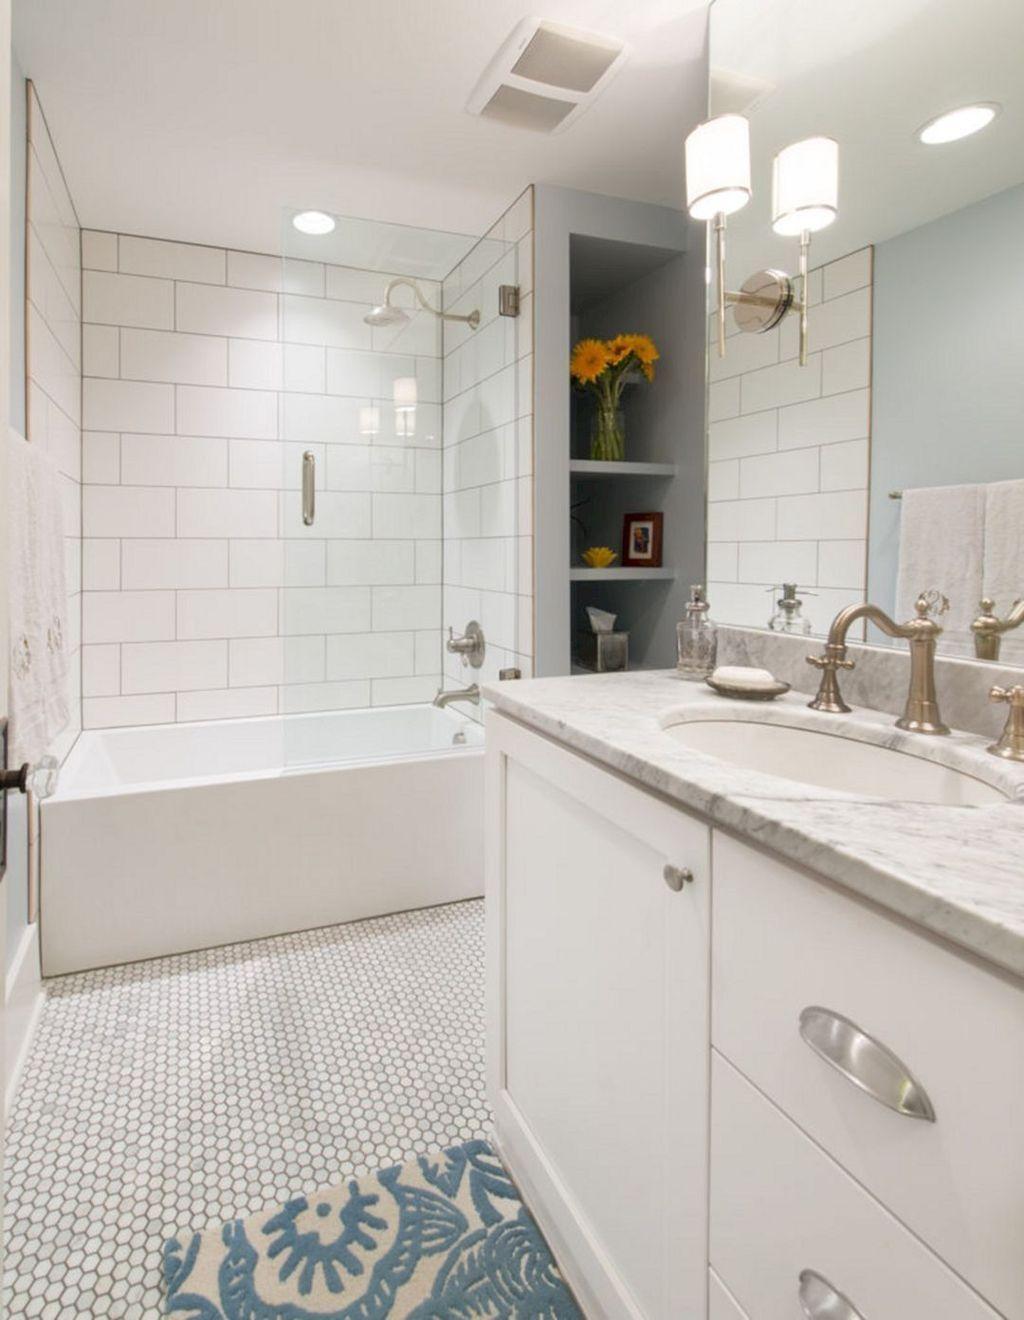 34 Lovely Bathroom Ceramic Tile Ideas You Should Copy Subway